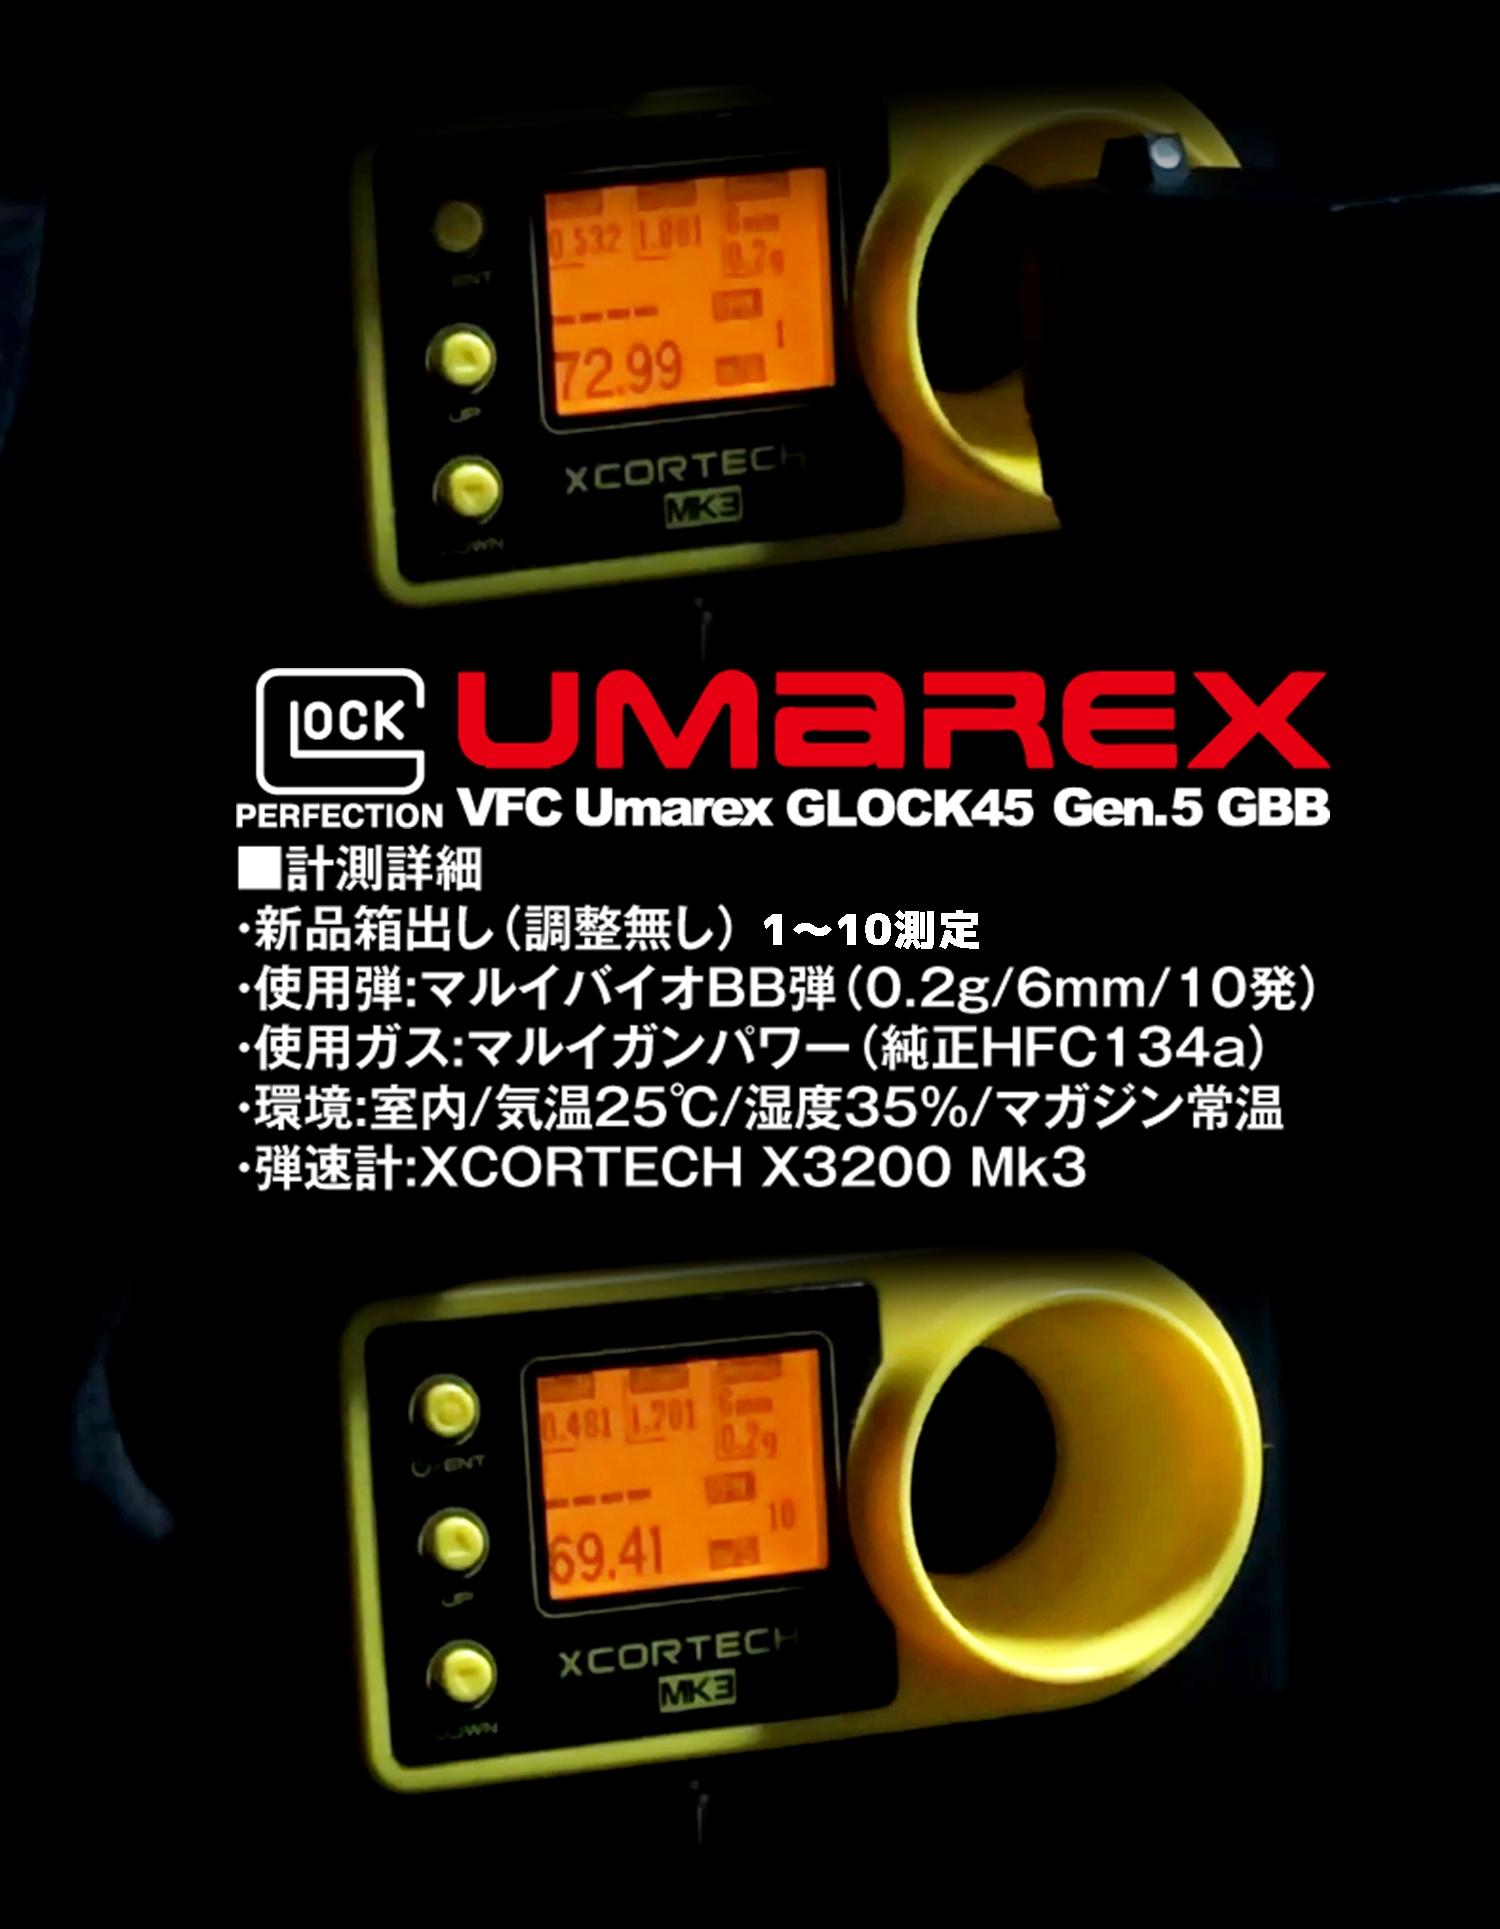 12 UMAREX VFC GLOCK G45 GBB AIRSOFT!! 噂のウマレックス G45 グロック ガスブローバック!! やっと我が家へ着弾 ~ 新品箱出し編!! 購入 開封 初速 計測 検証 比較 通常分解 組立 カスタム レビュー!!